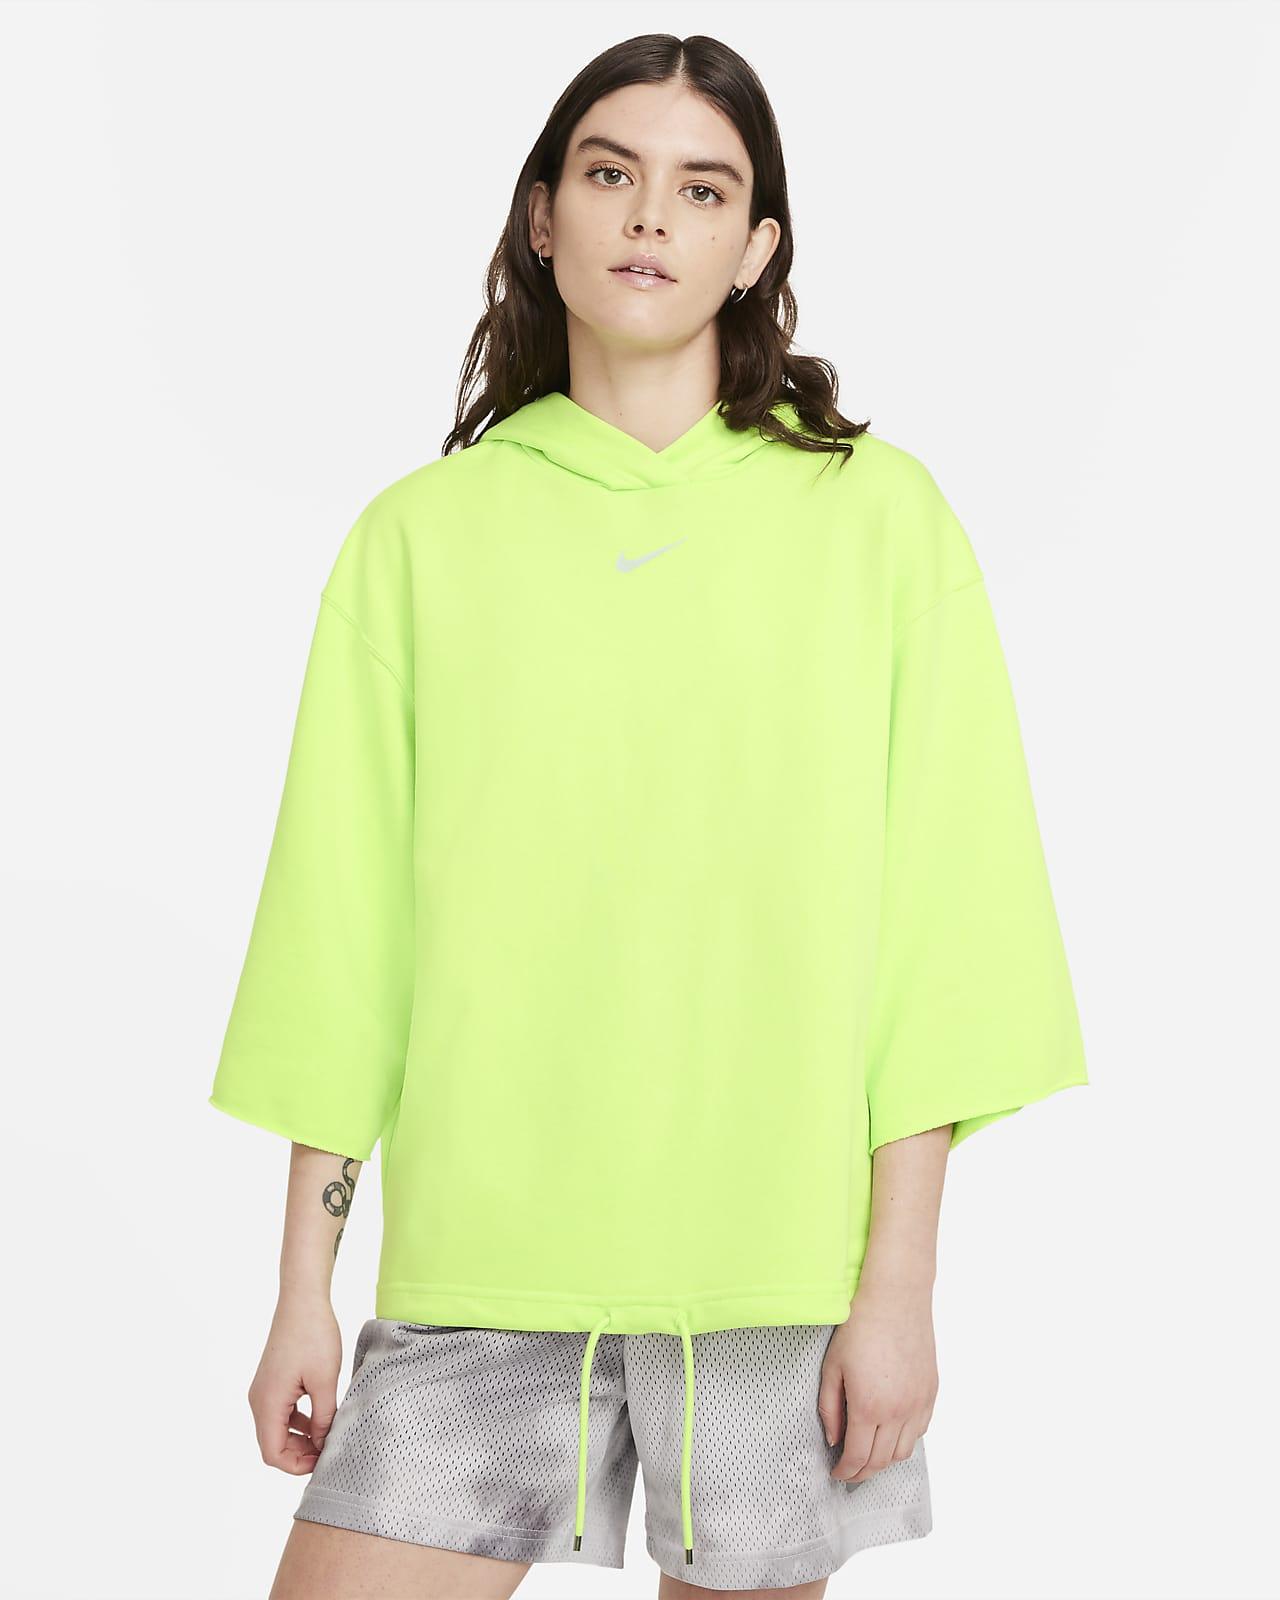 Sudadera con gorro de manga corta para mujer Nike Sportswear Icon Clash